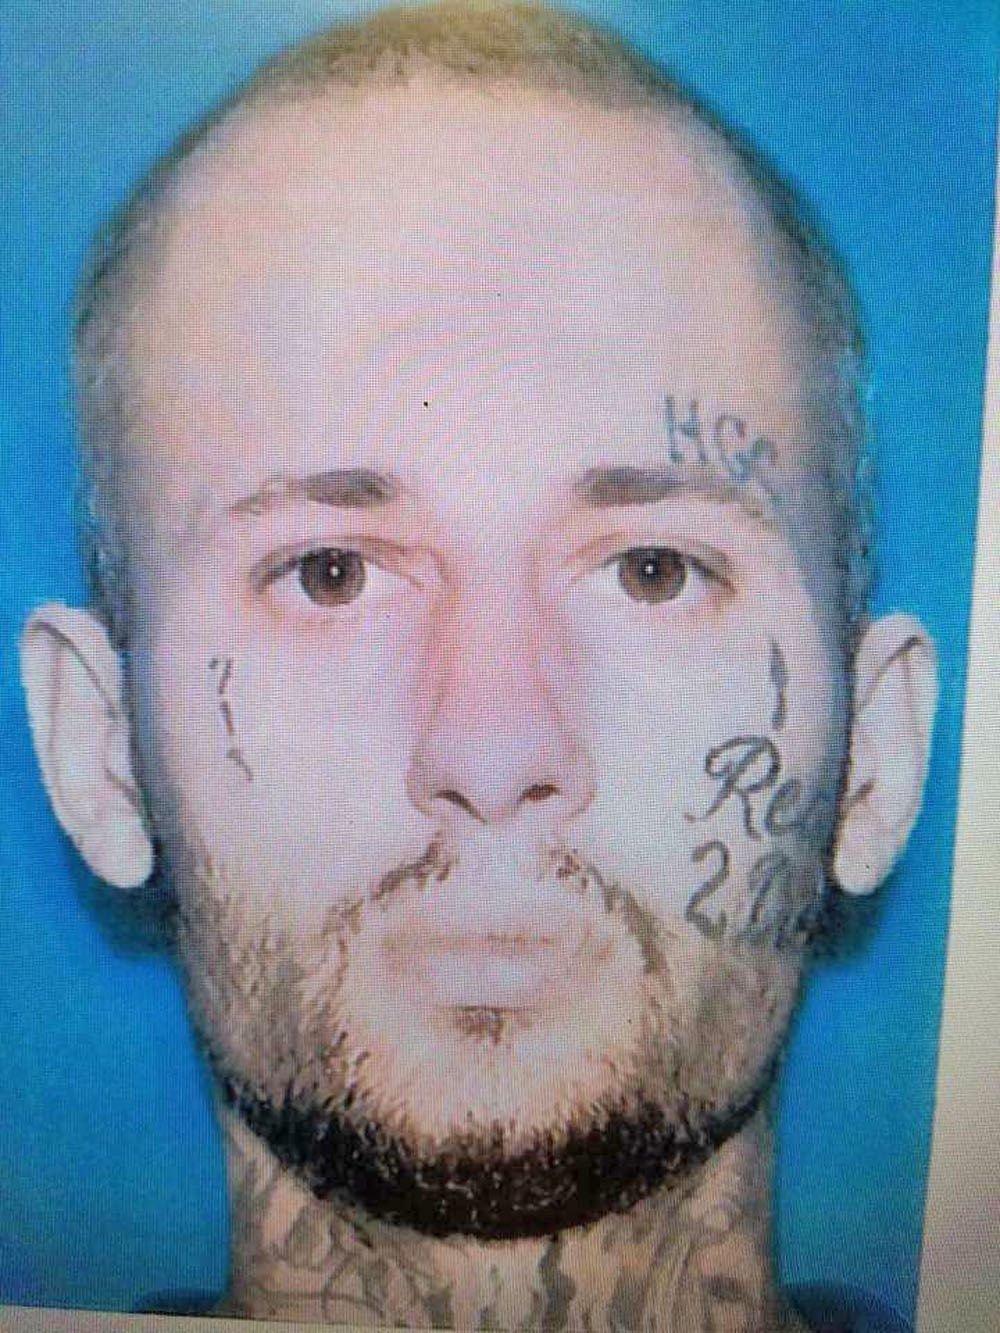 Agencies bust Ferguson for Navarro County drug ties | News